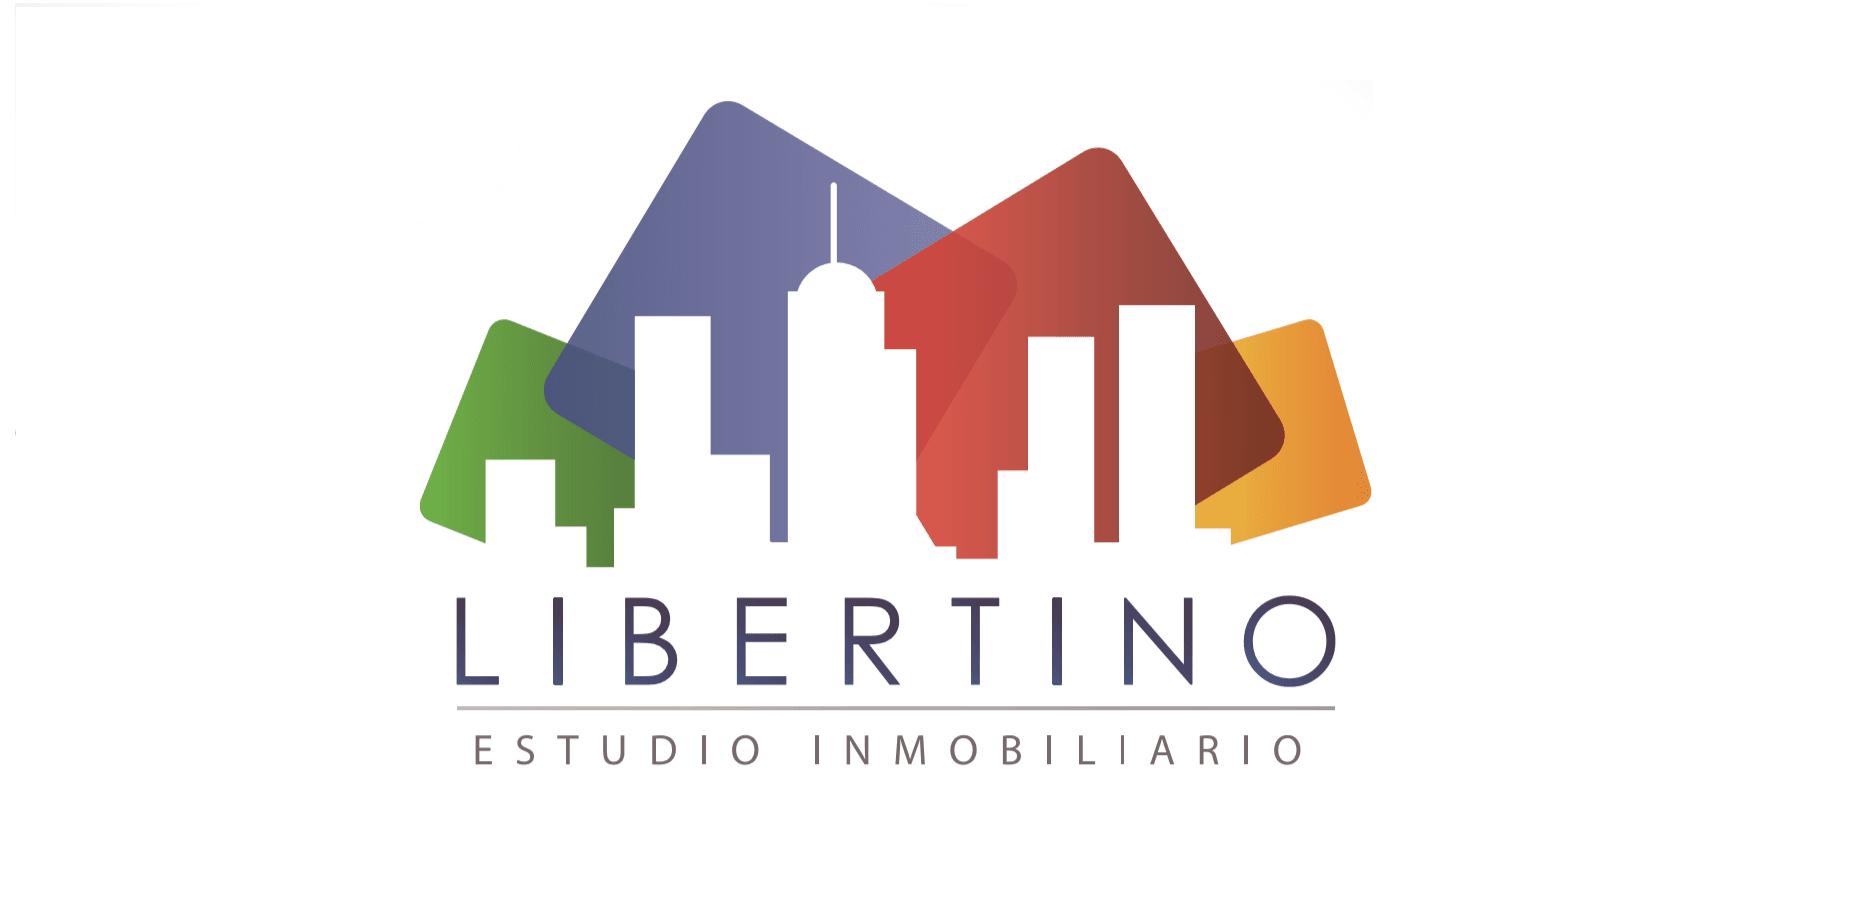 Logo de  Libertinoestudioinmobiliario